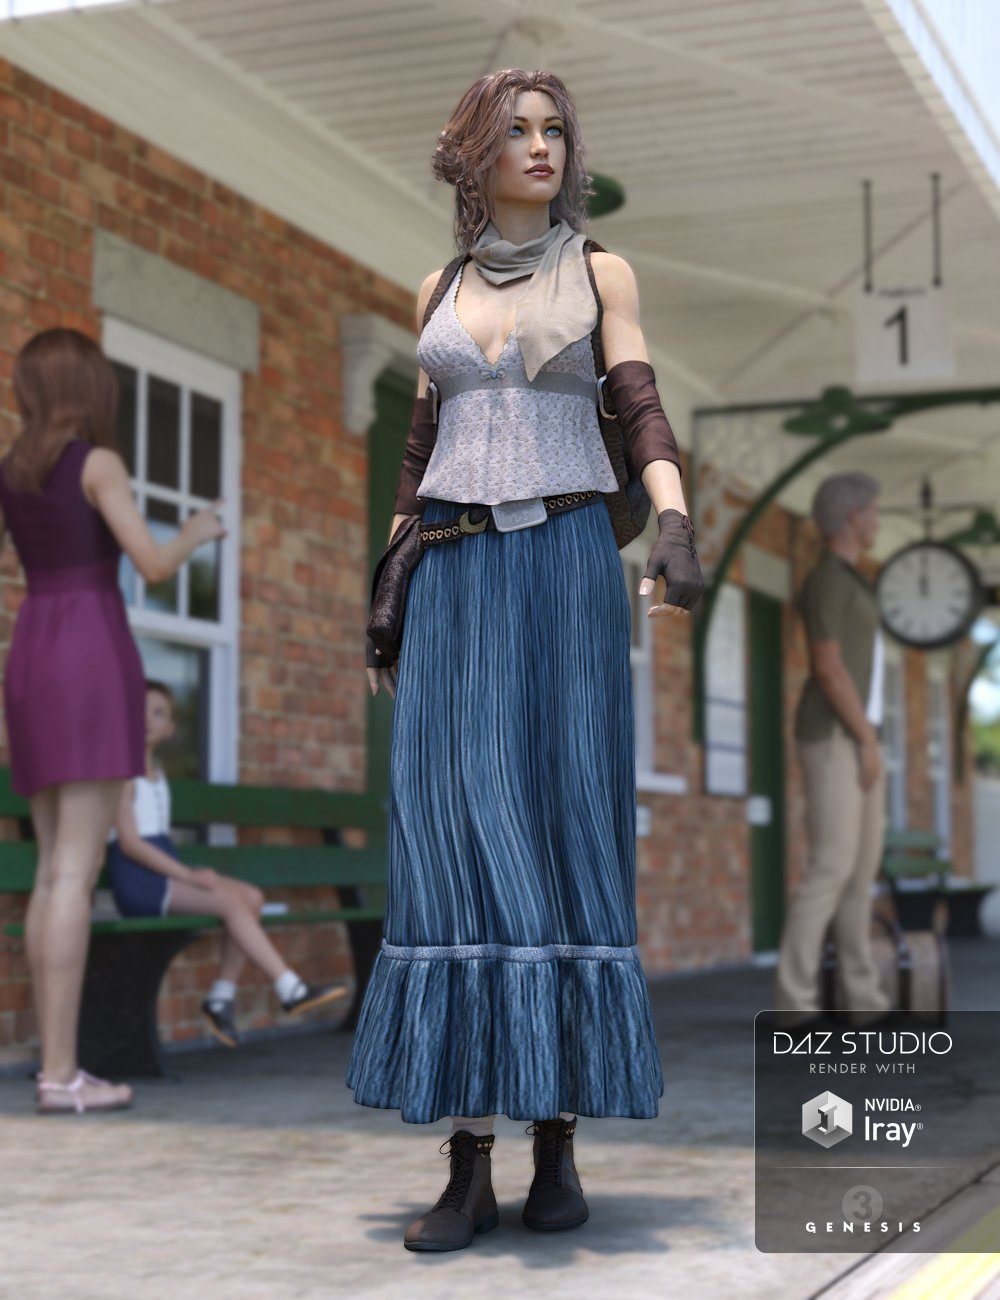 Vagabond for Genesis 3 Female(s) by: Ravenhair, 3D Models by Daz 3D